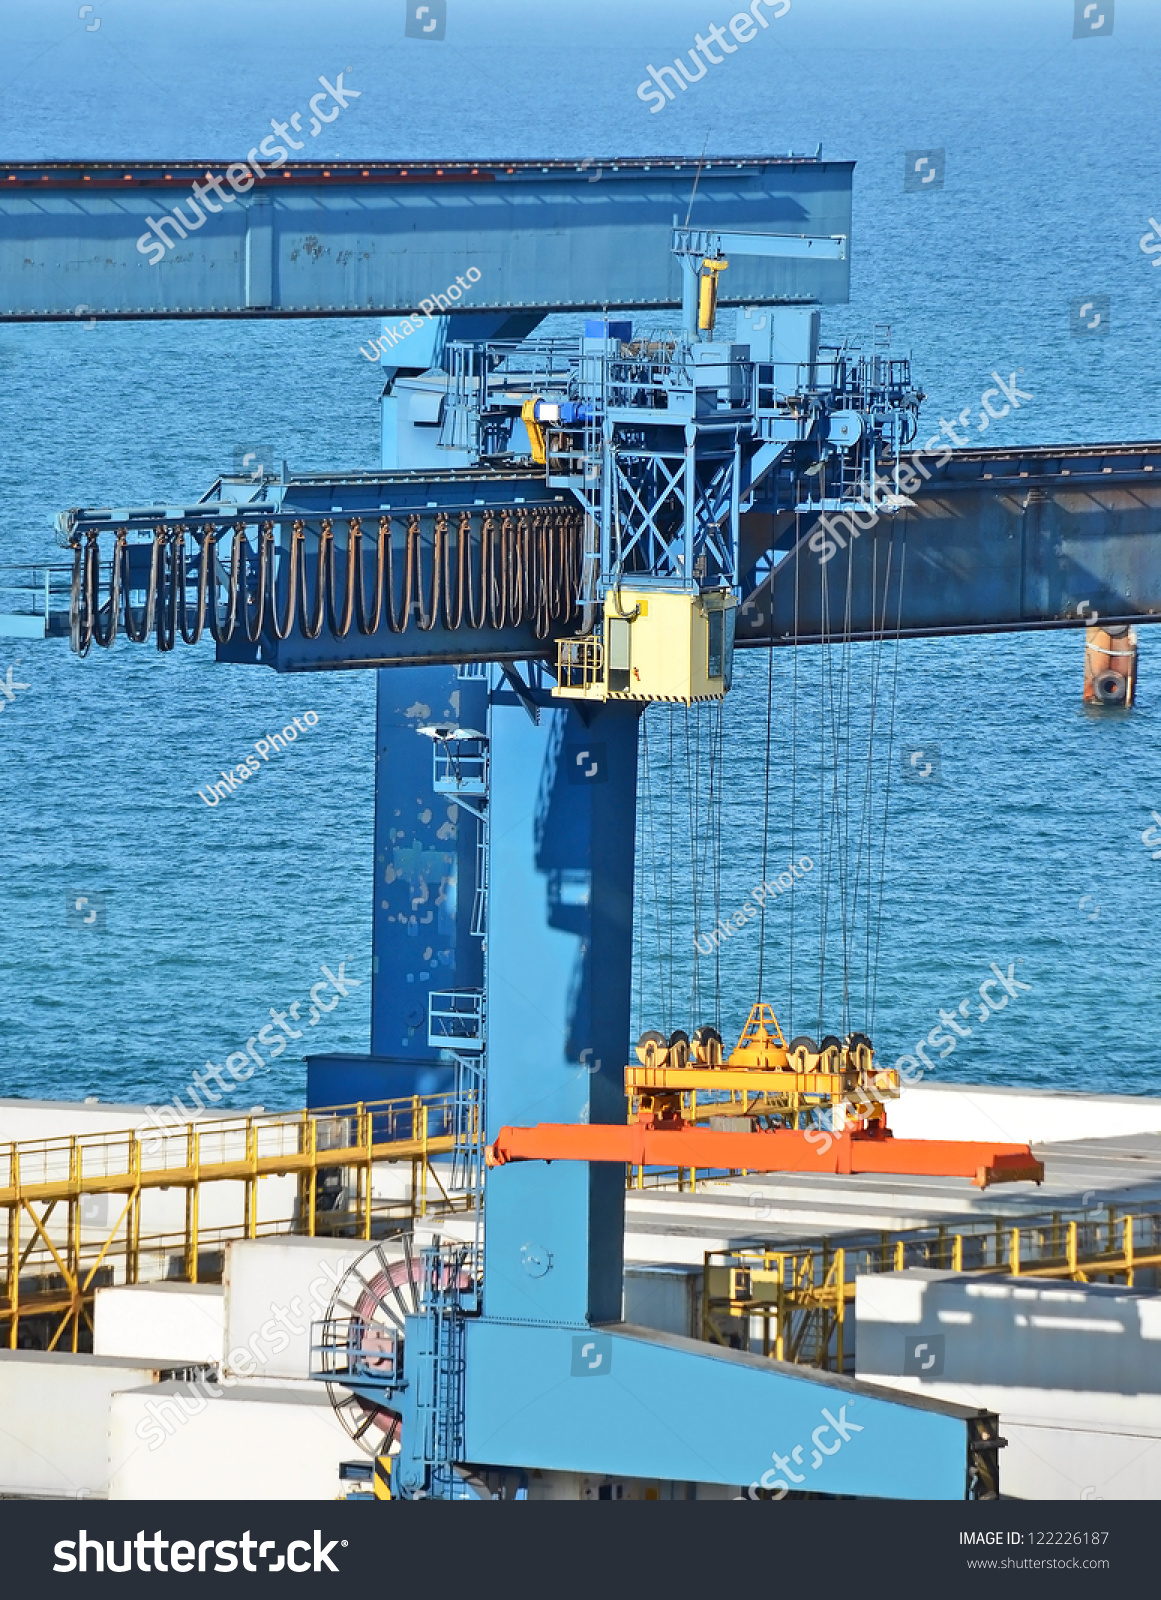 Harbor Freight Gantry Crane >> Port Cargo Crane Container Over Blue Stock Photo 122226187 - Shutterstock